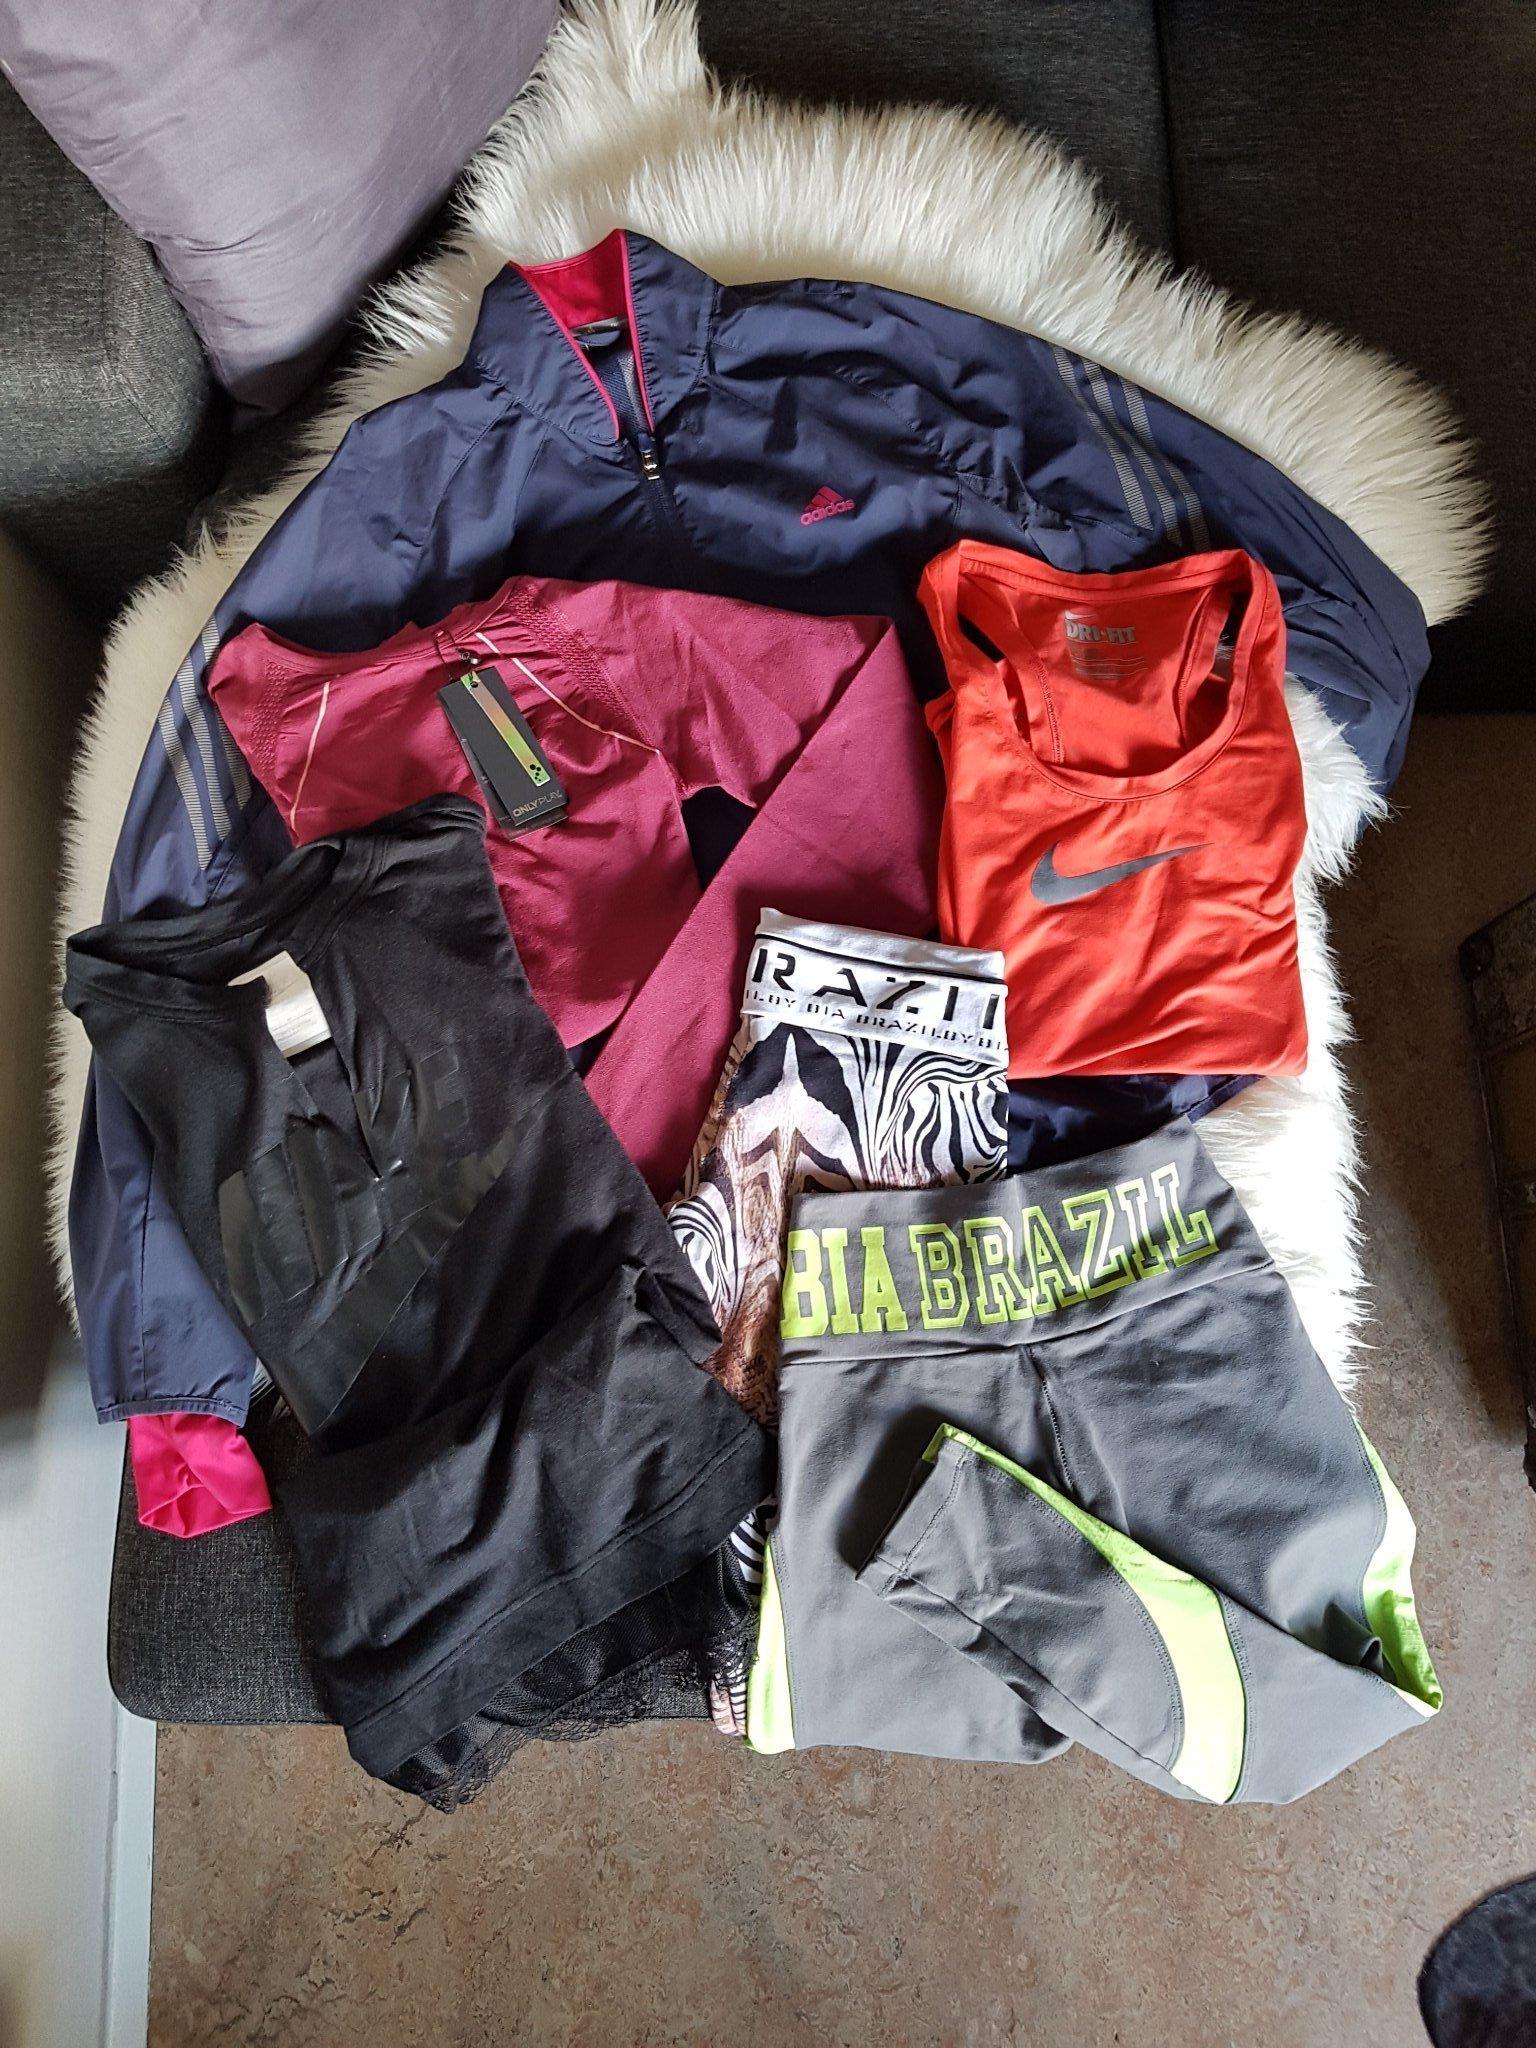 nyanlända höstskor utloppsbutik Nike adidas bia brazil linne tights gym fitness.. (351537897) ᐈ ...